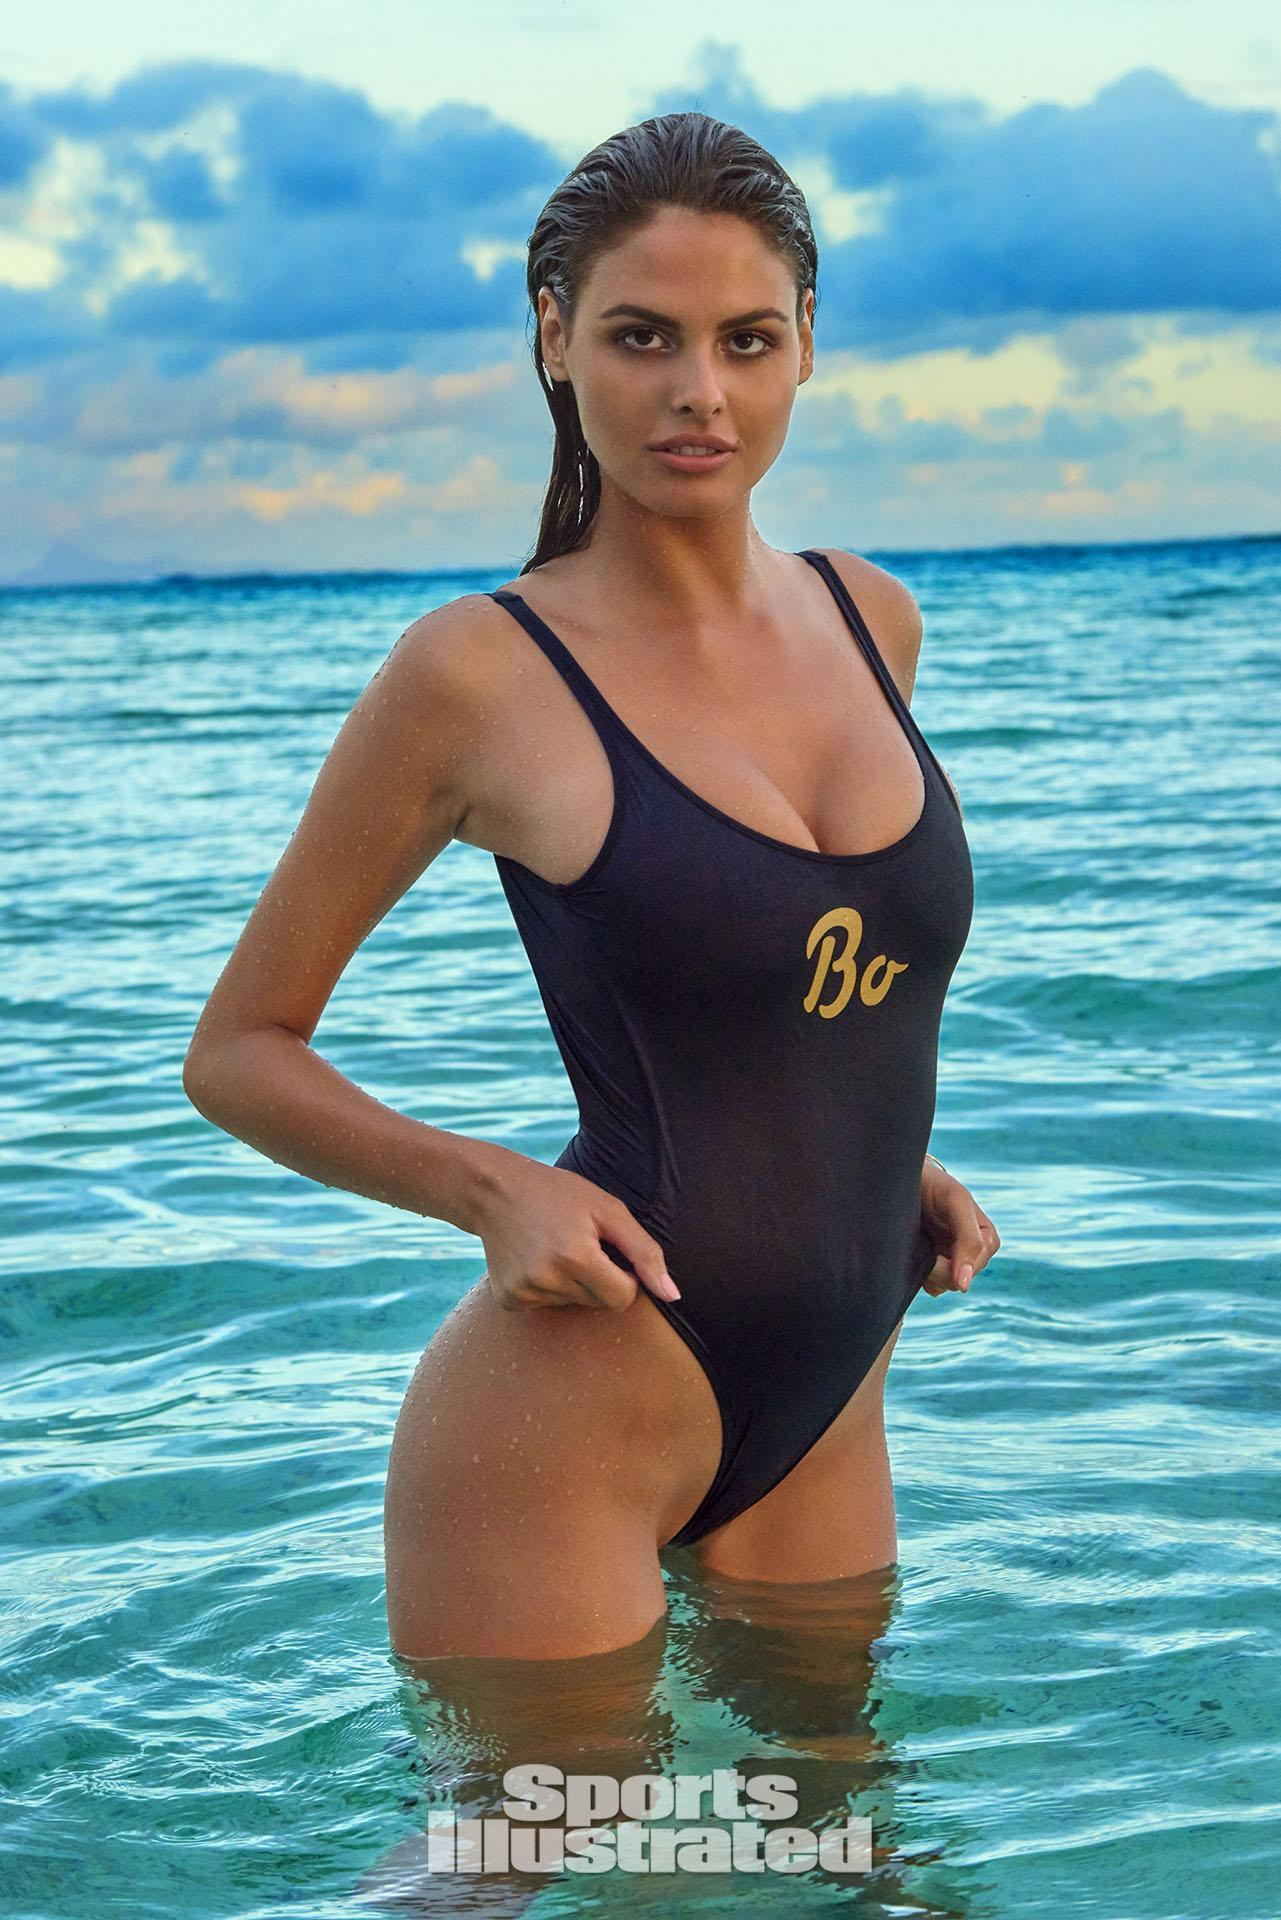 Fotos mujeres desnudas argentinas pics 89